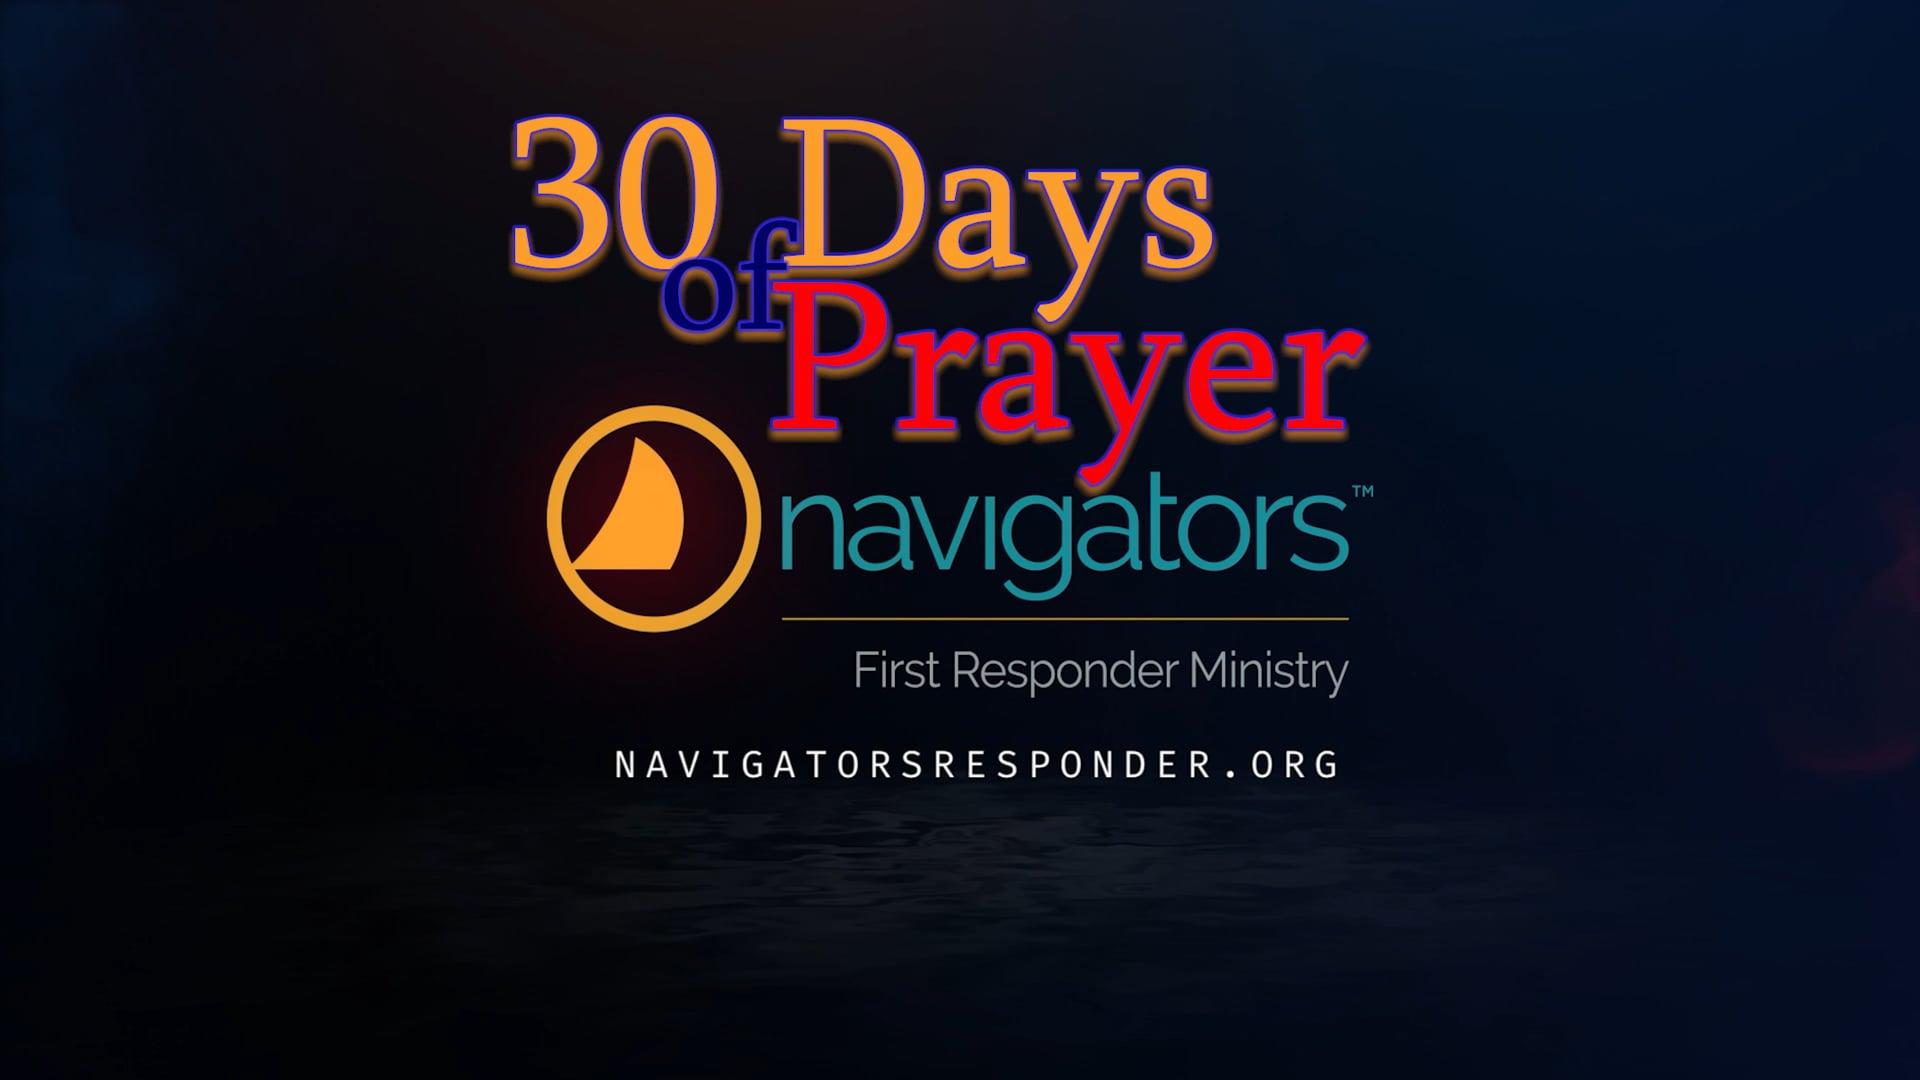 Spring 2020: 30 Days of Prayer: Video 1 - The Prayer Warriors